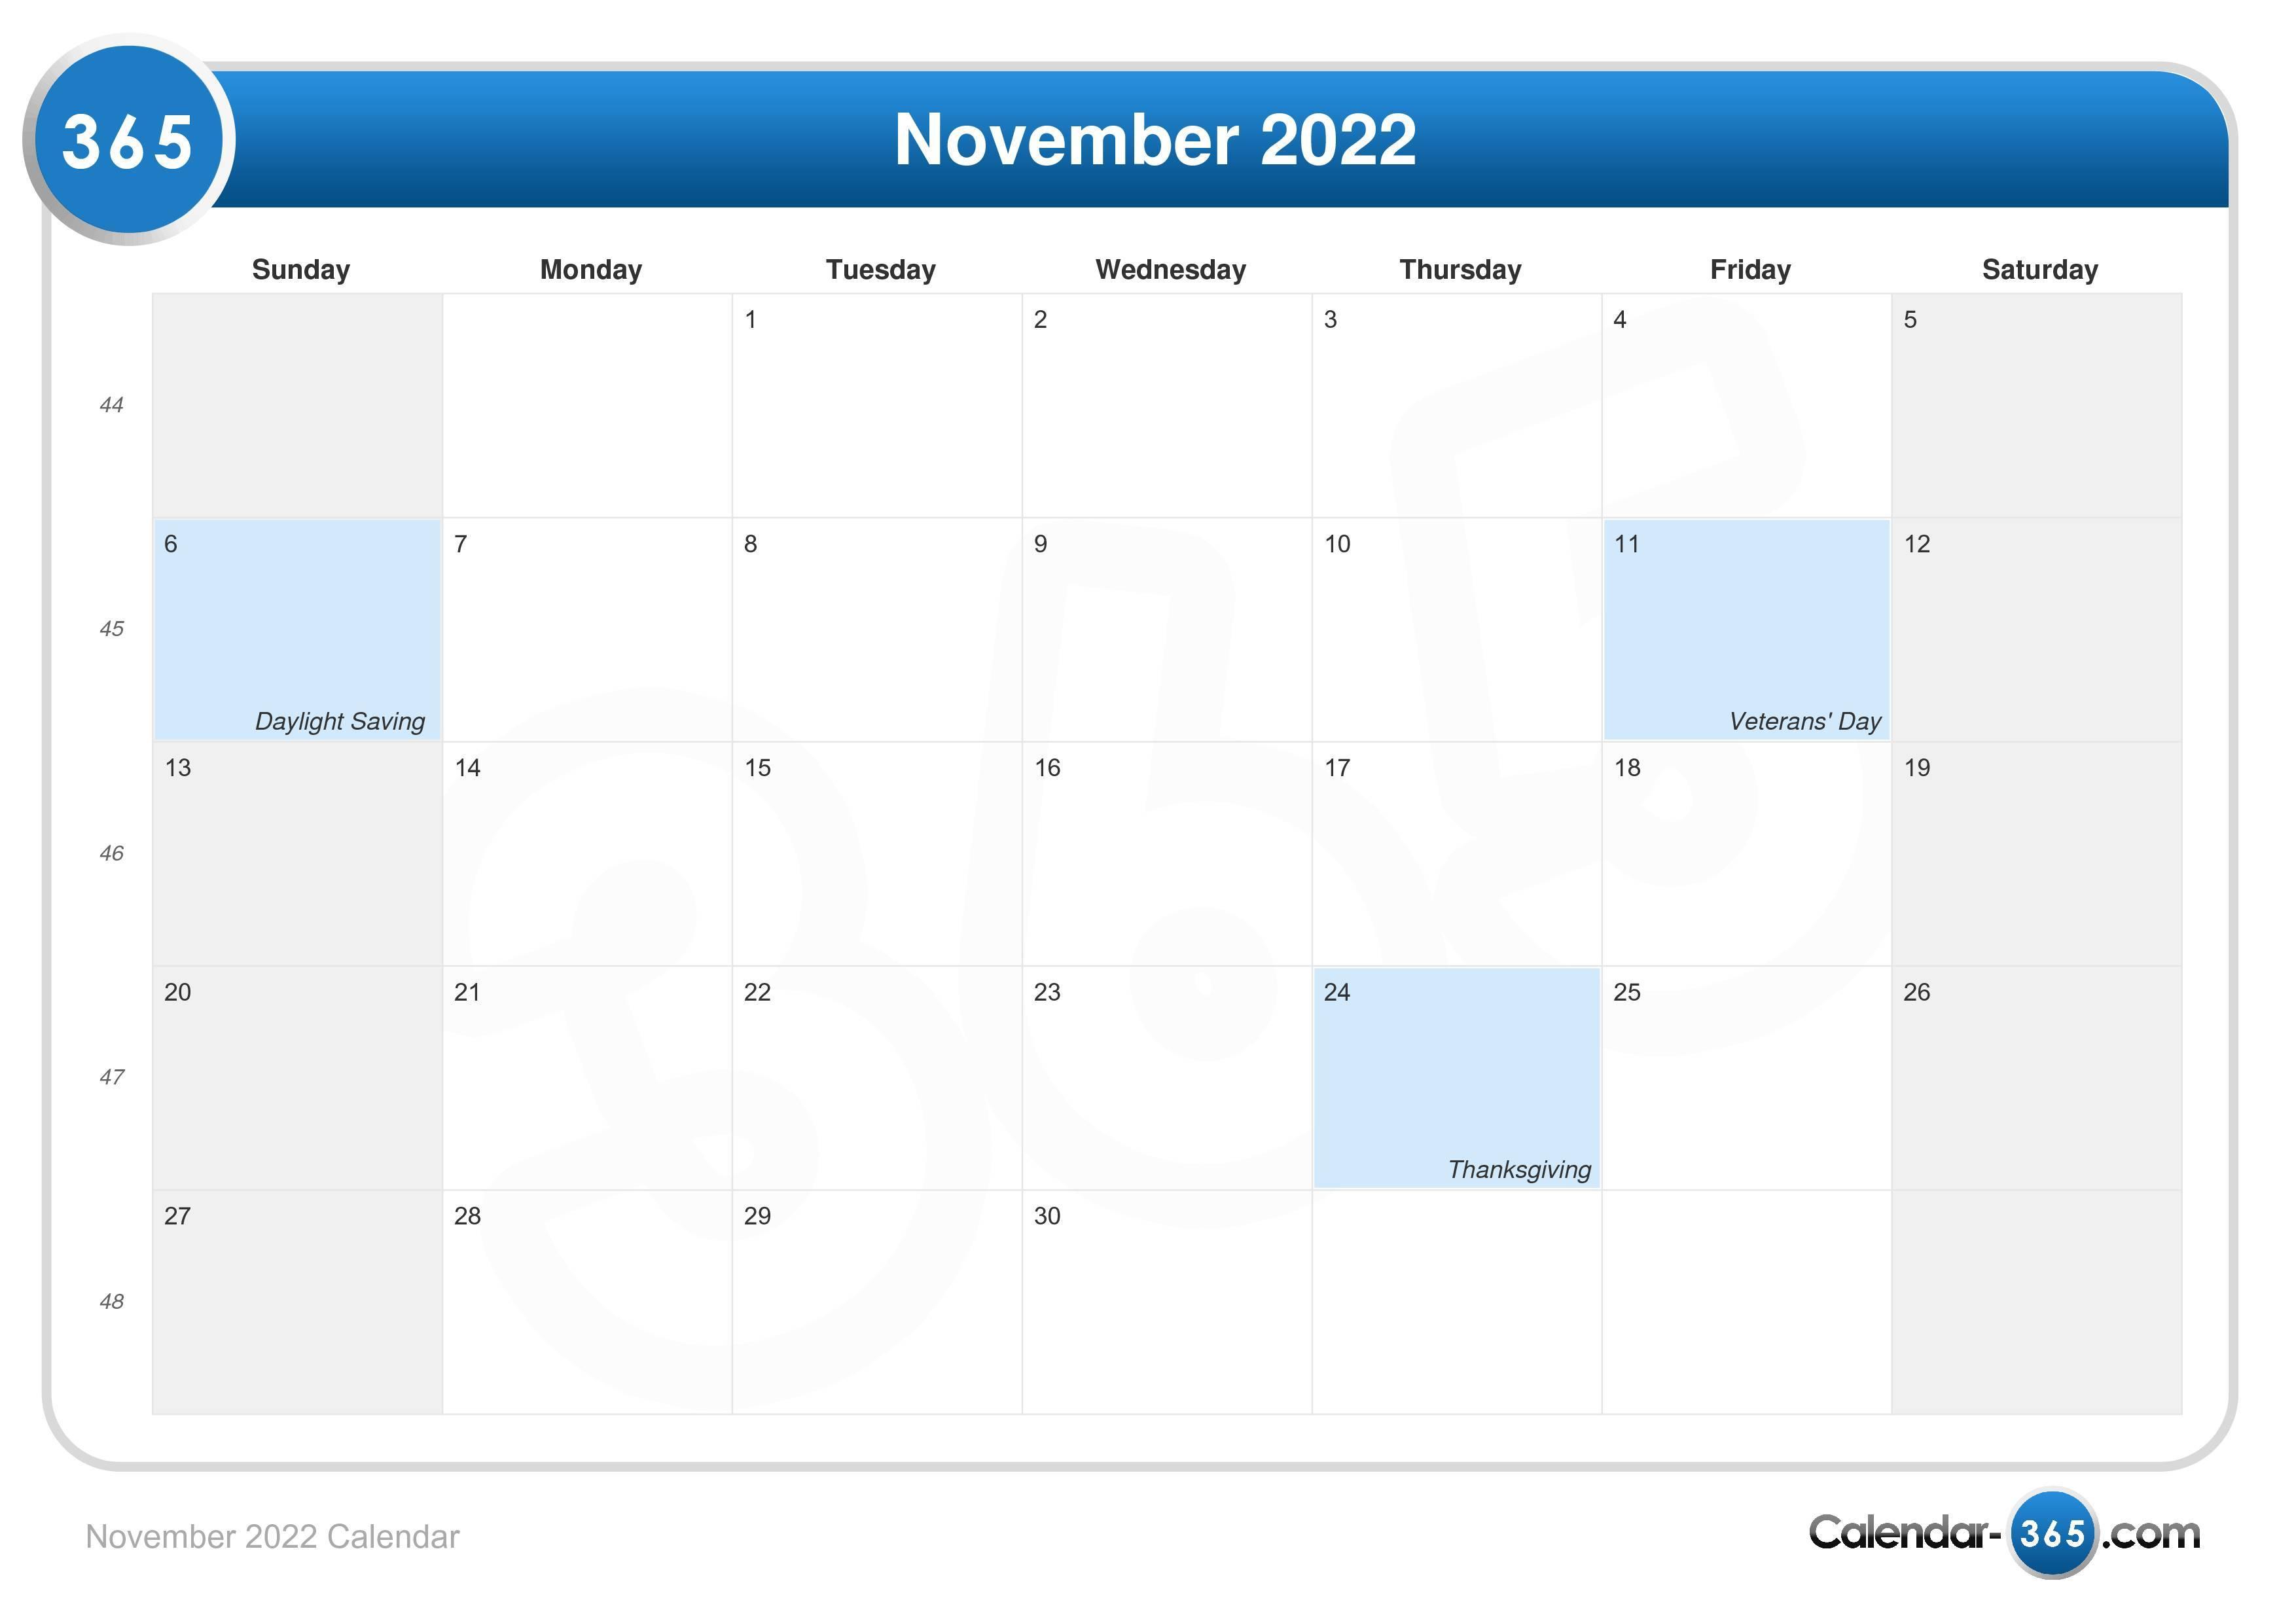 Calendar November 2022.November 2022 Calendar